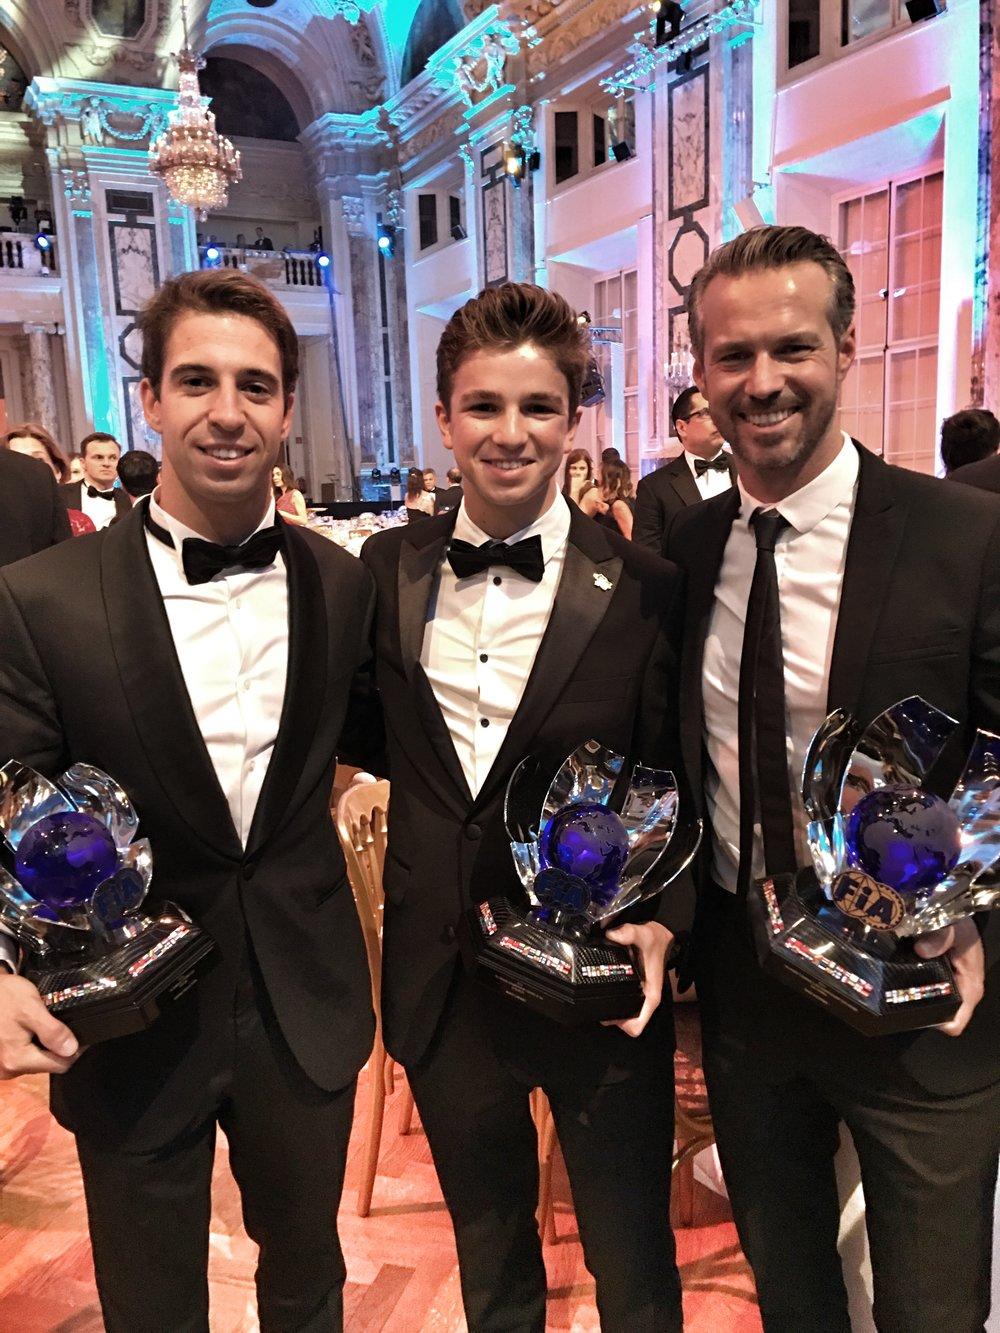 Antonio Felix da Costa, Bruno Carneiro and Tiago Monteiro